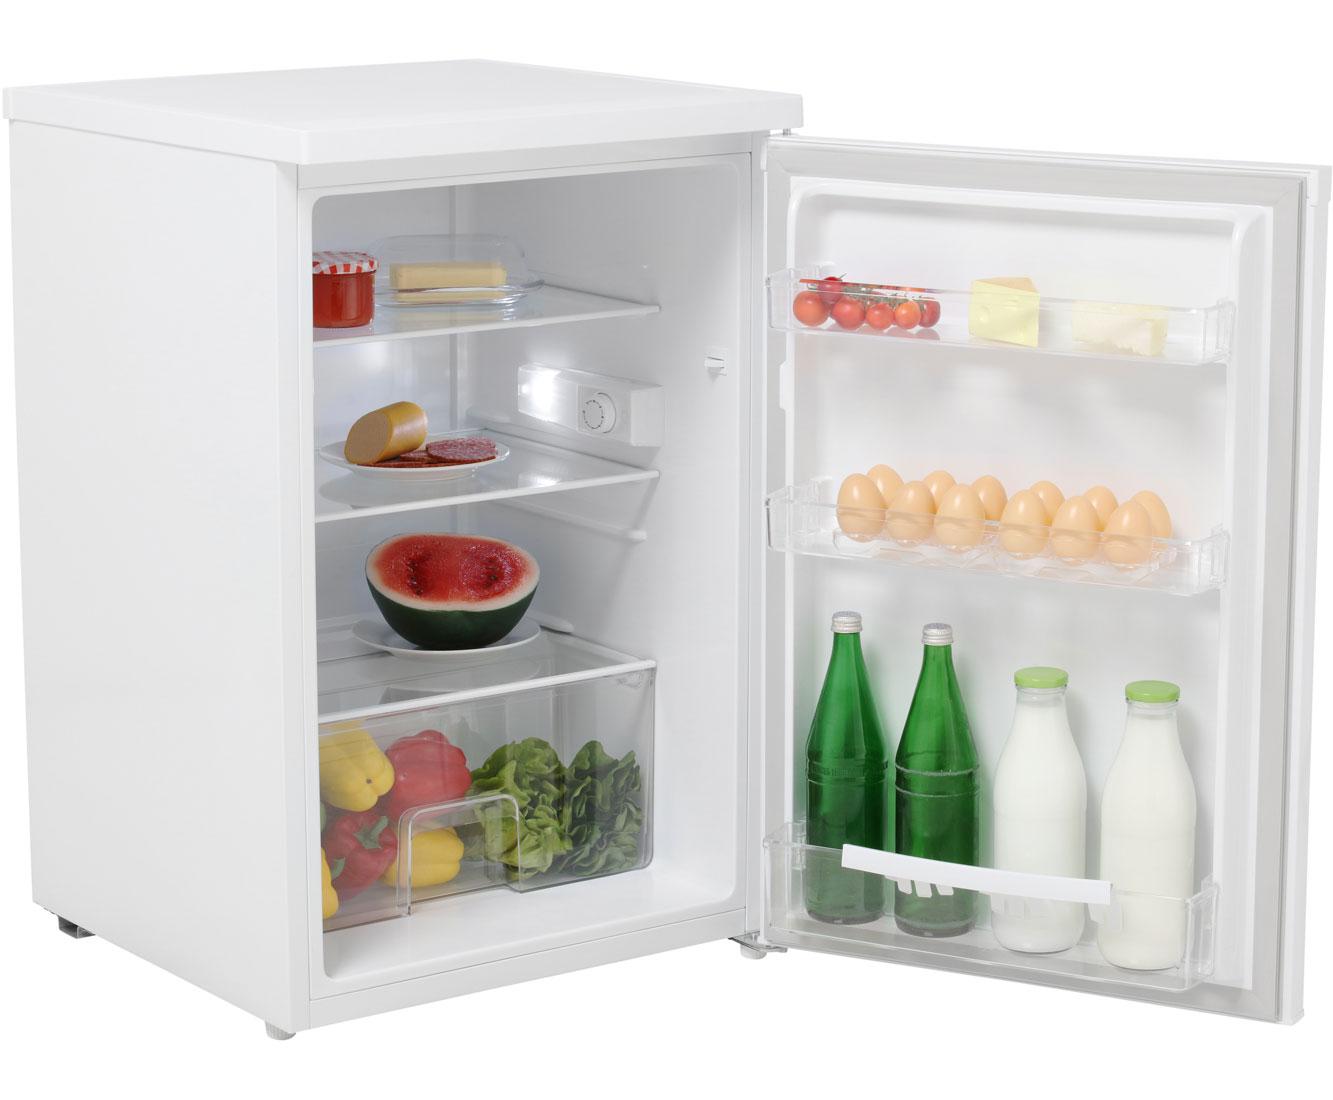 Bomann Kühlschrank Zu Warm : Bomann vs kühlschrank freistehend cm weiß neu ebay